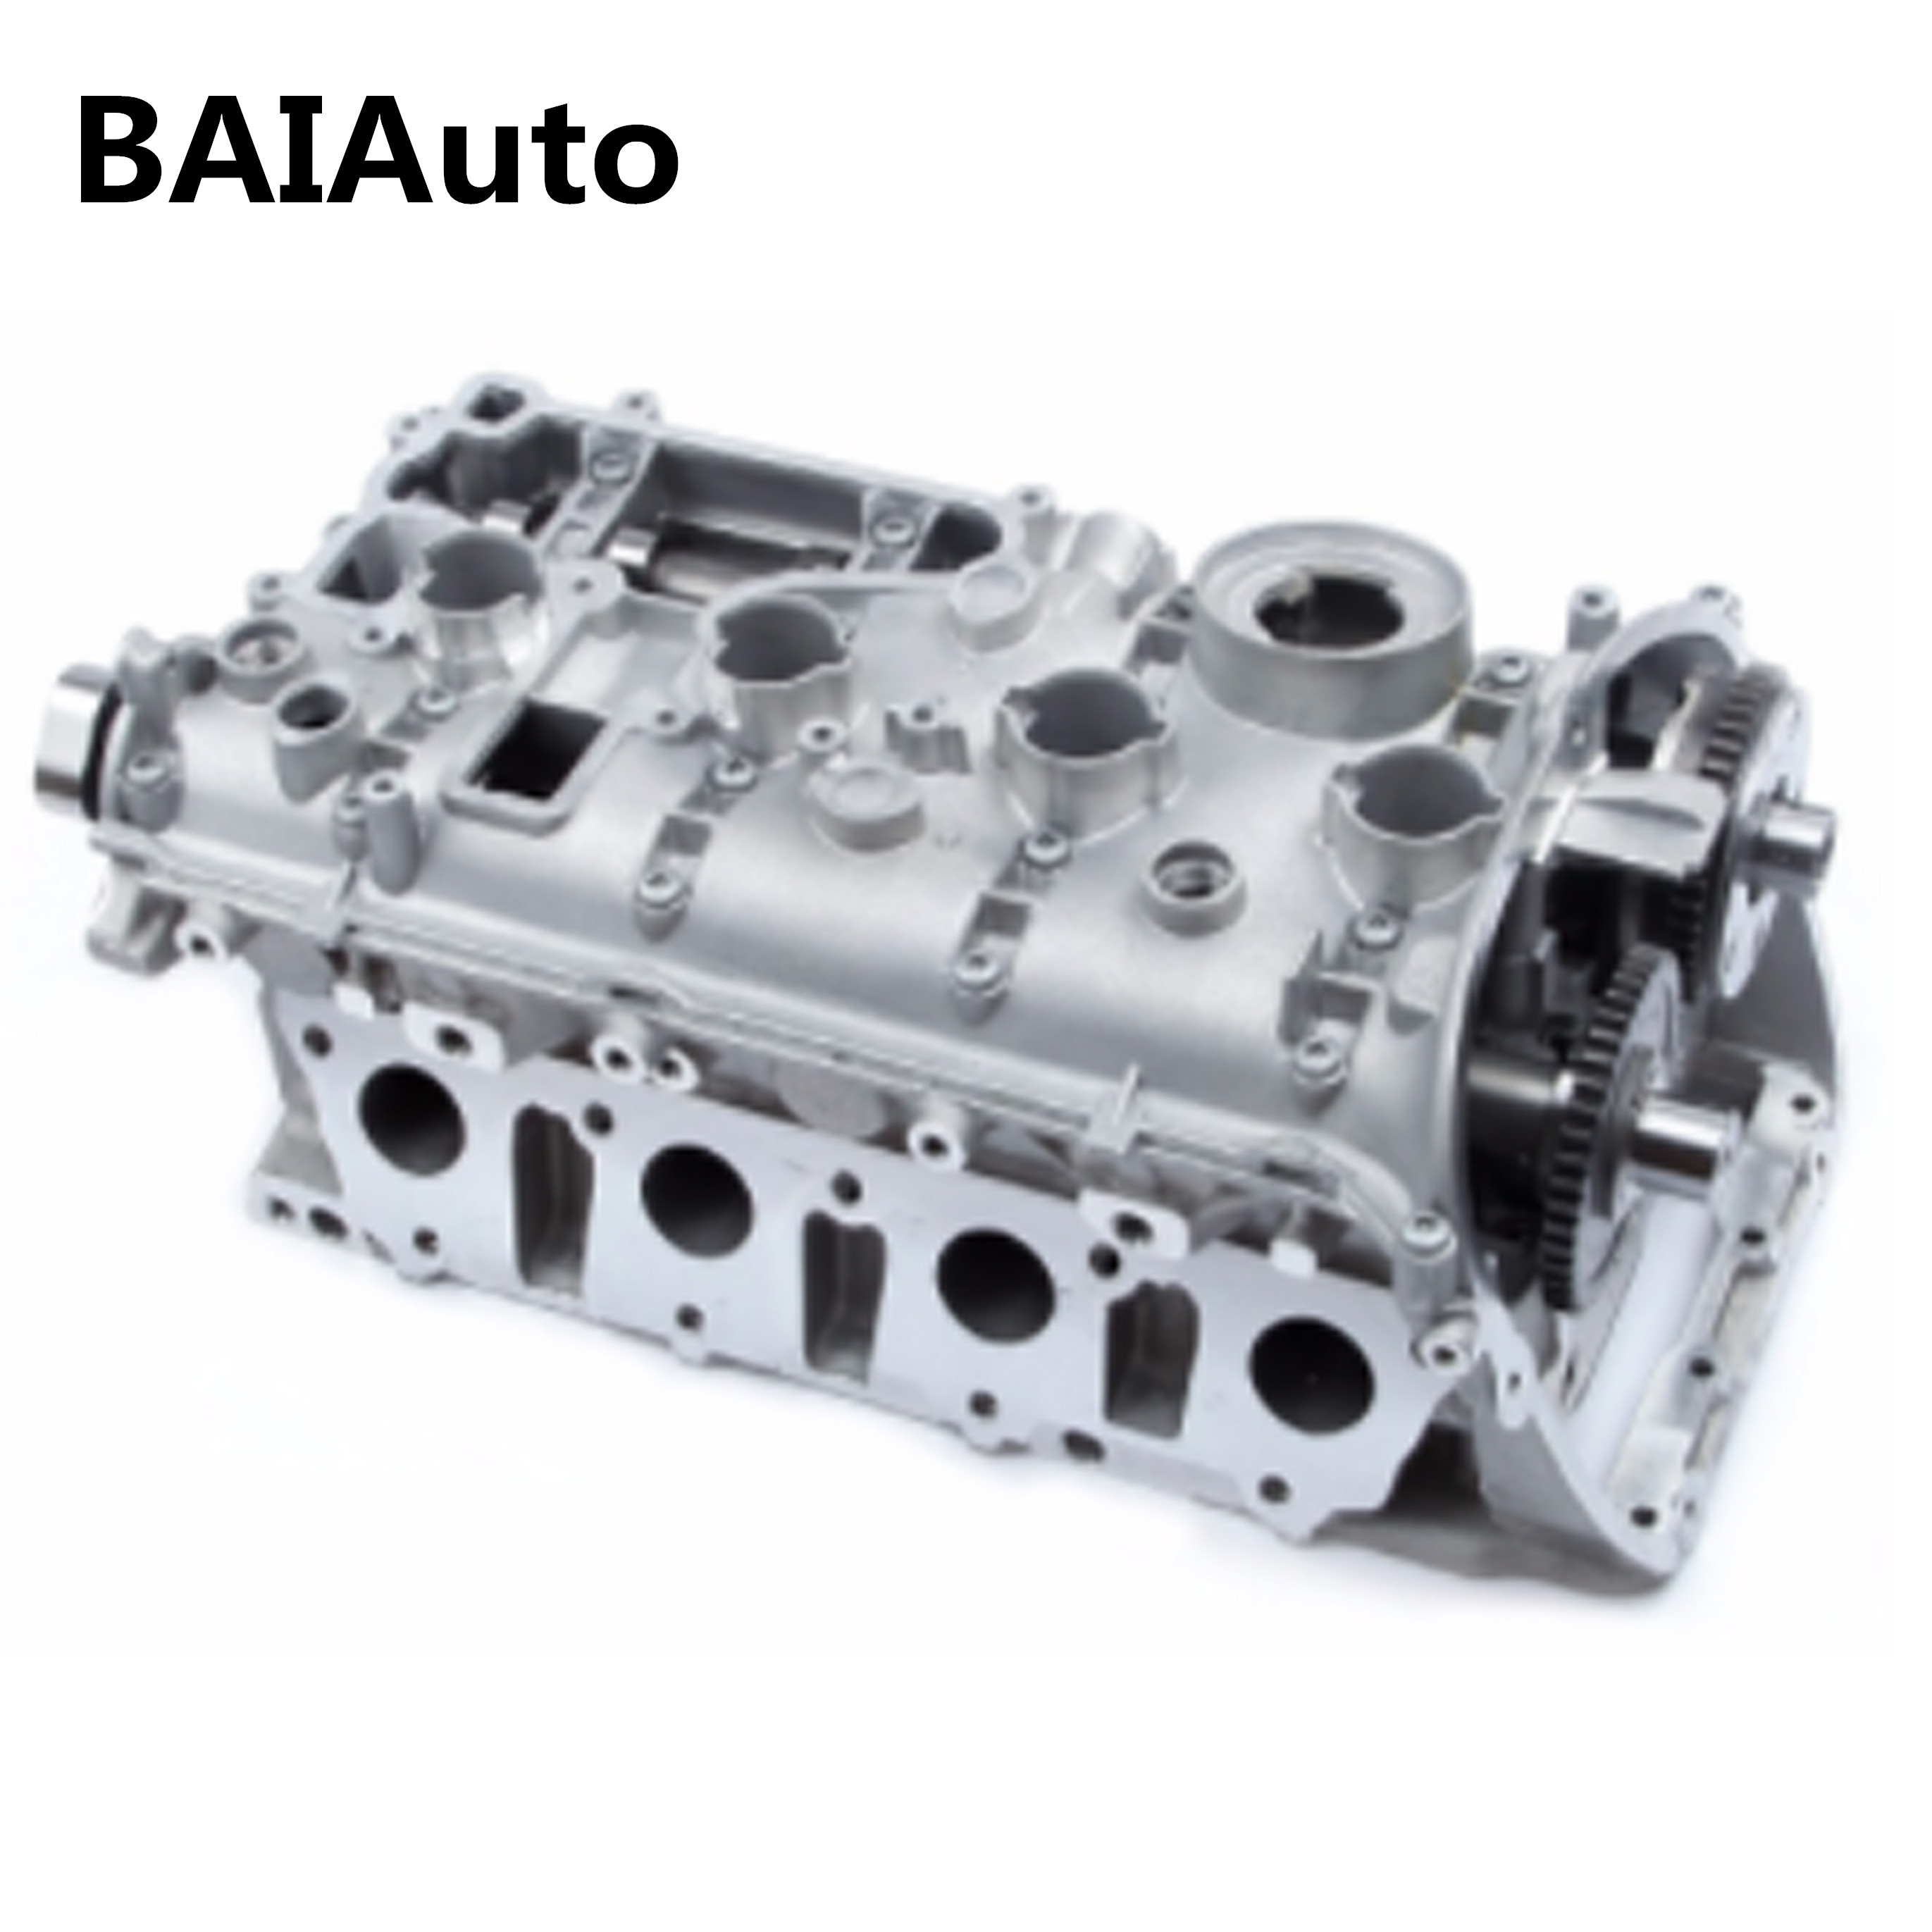 Audi Tt 2006-2014 Oem Cylinder Head Gasket Engine Block Replacement